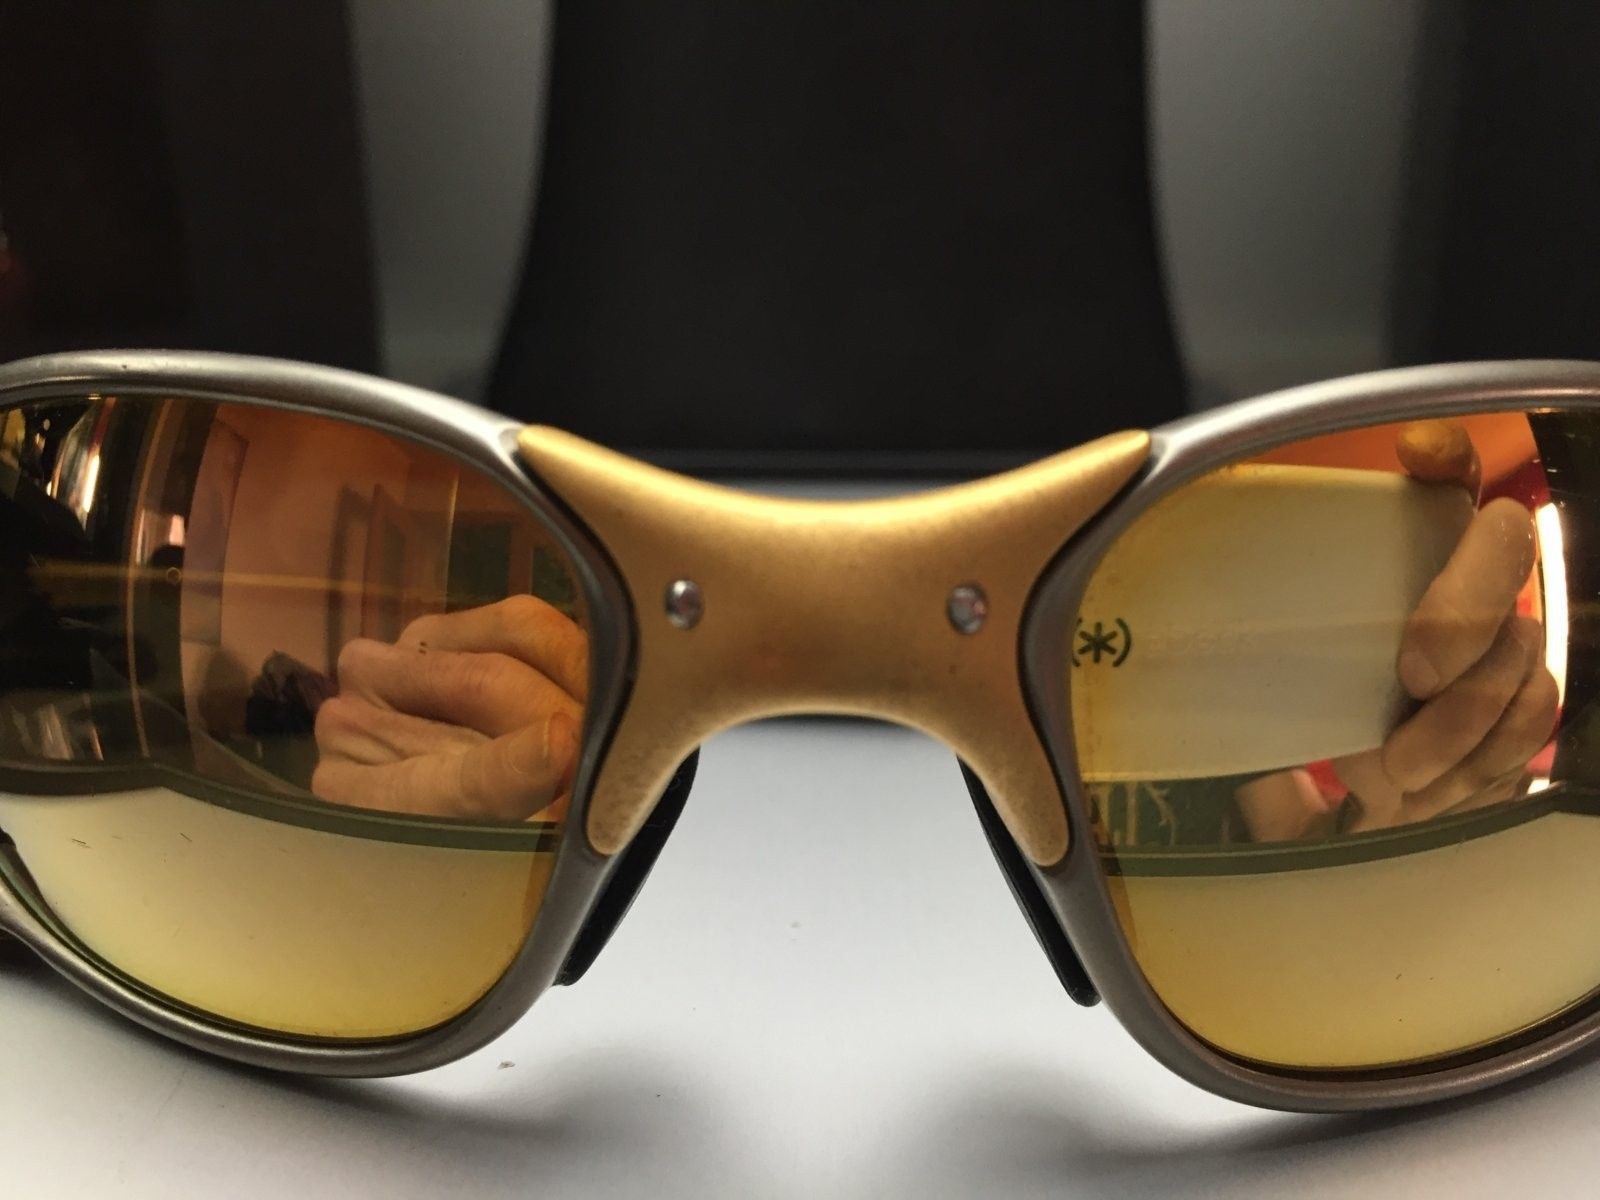 My Glasses Frames Are Peeling : Oakley Lens Flaking Louisiana Bucket Brigade